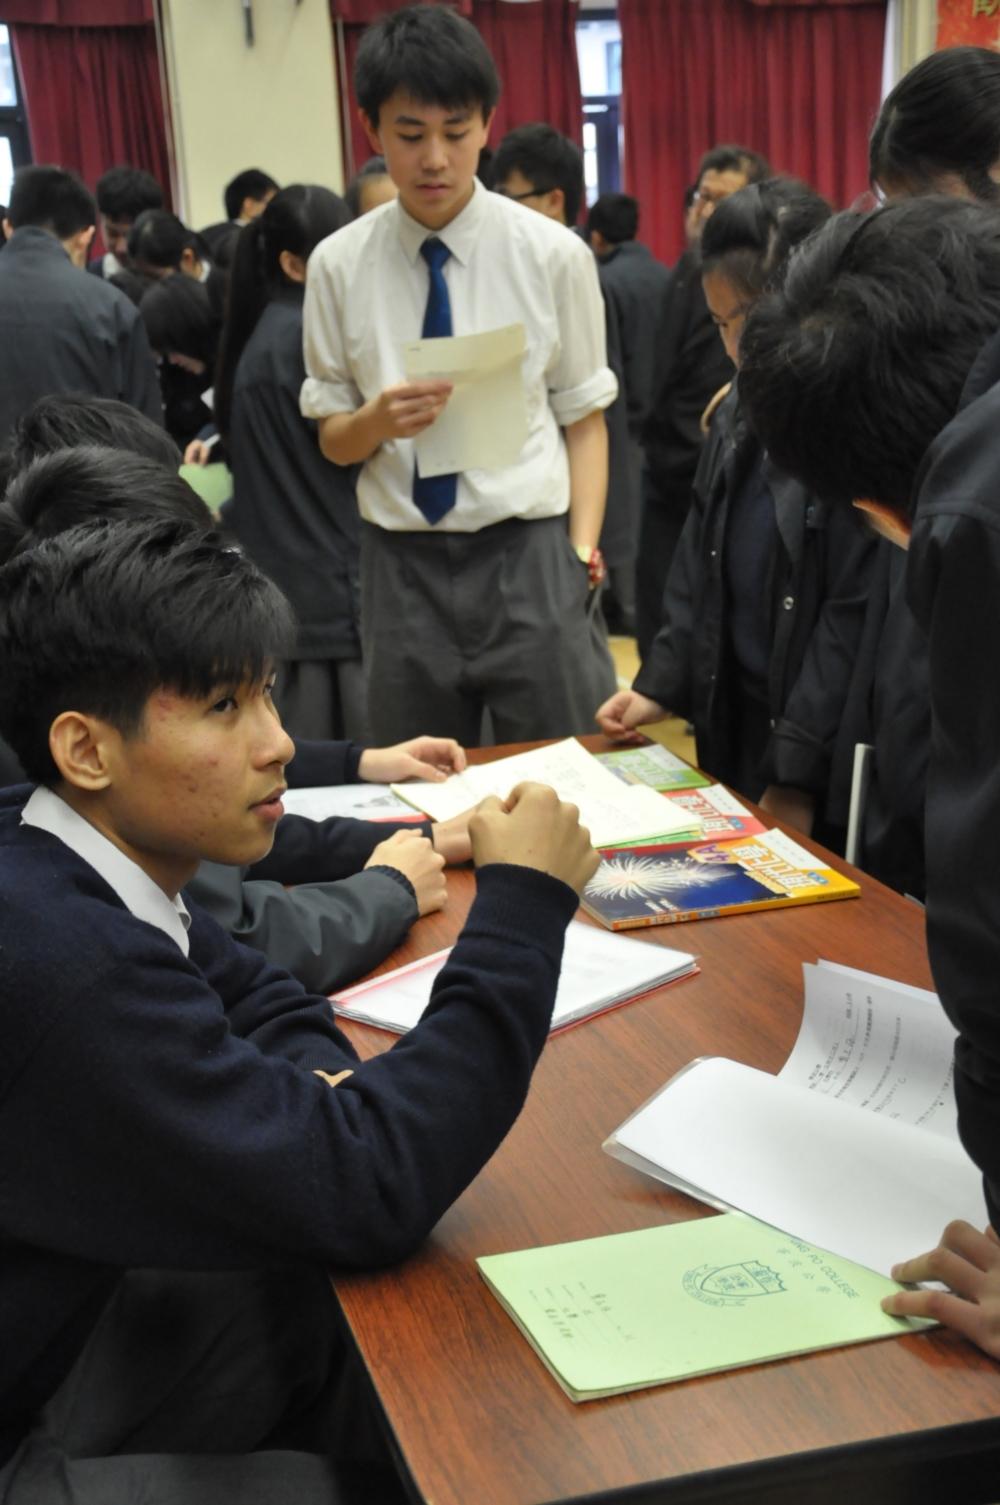 http://www.npc.edu.hk/sites/default/files/4_809.jpg